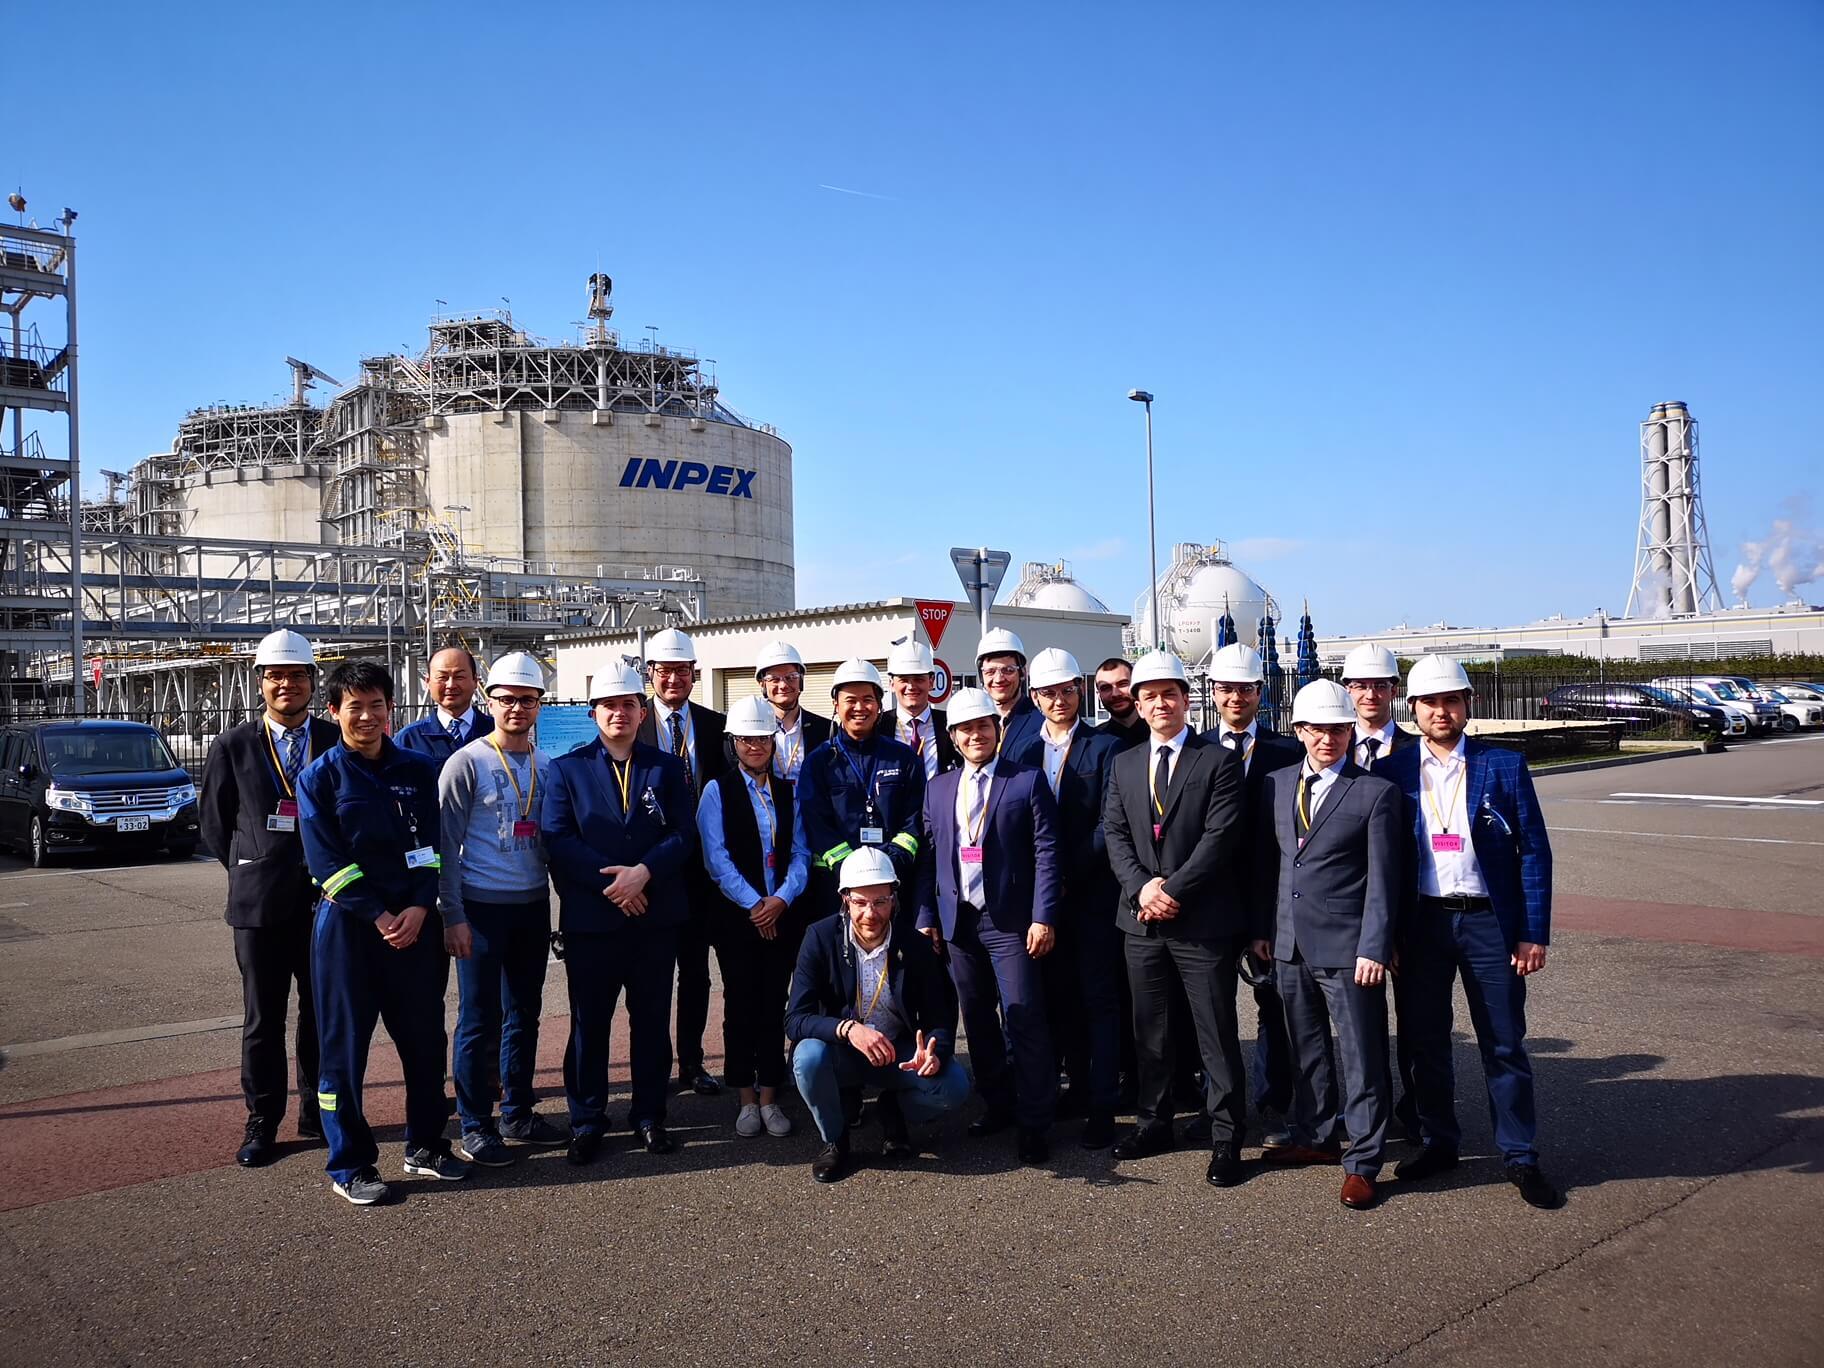 Naoetsu LNG Terminal, НОВАТЭК, повышение квалификации